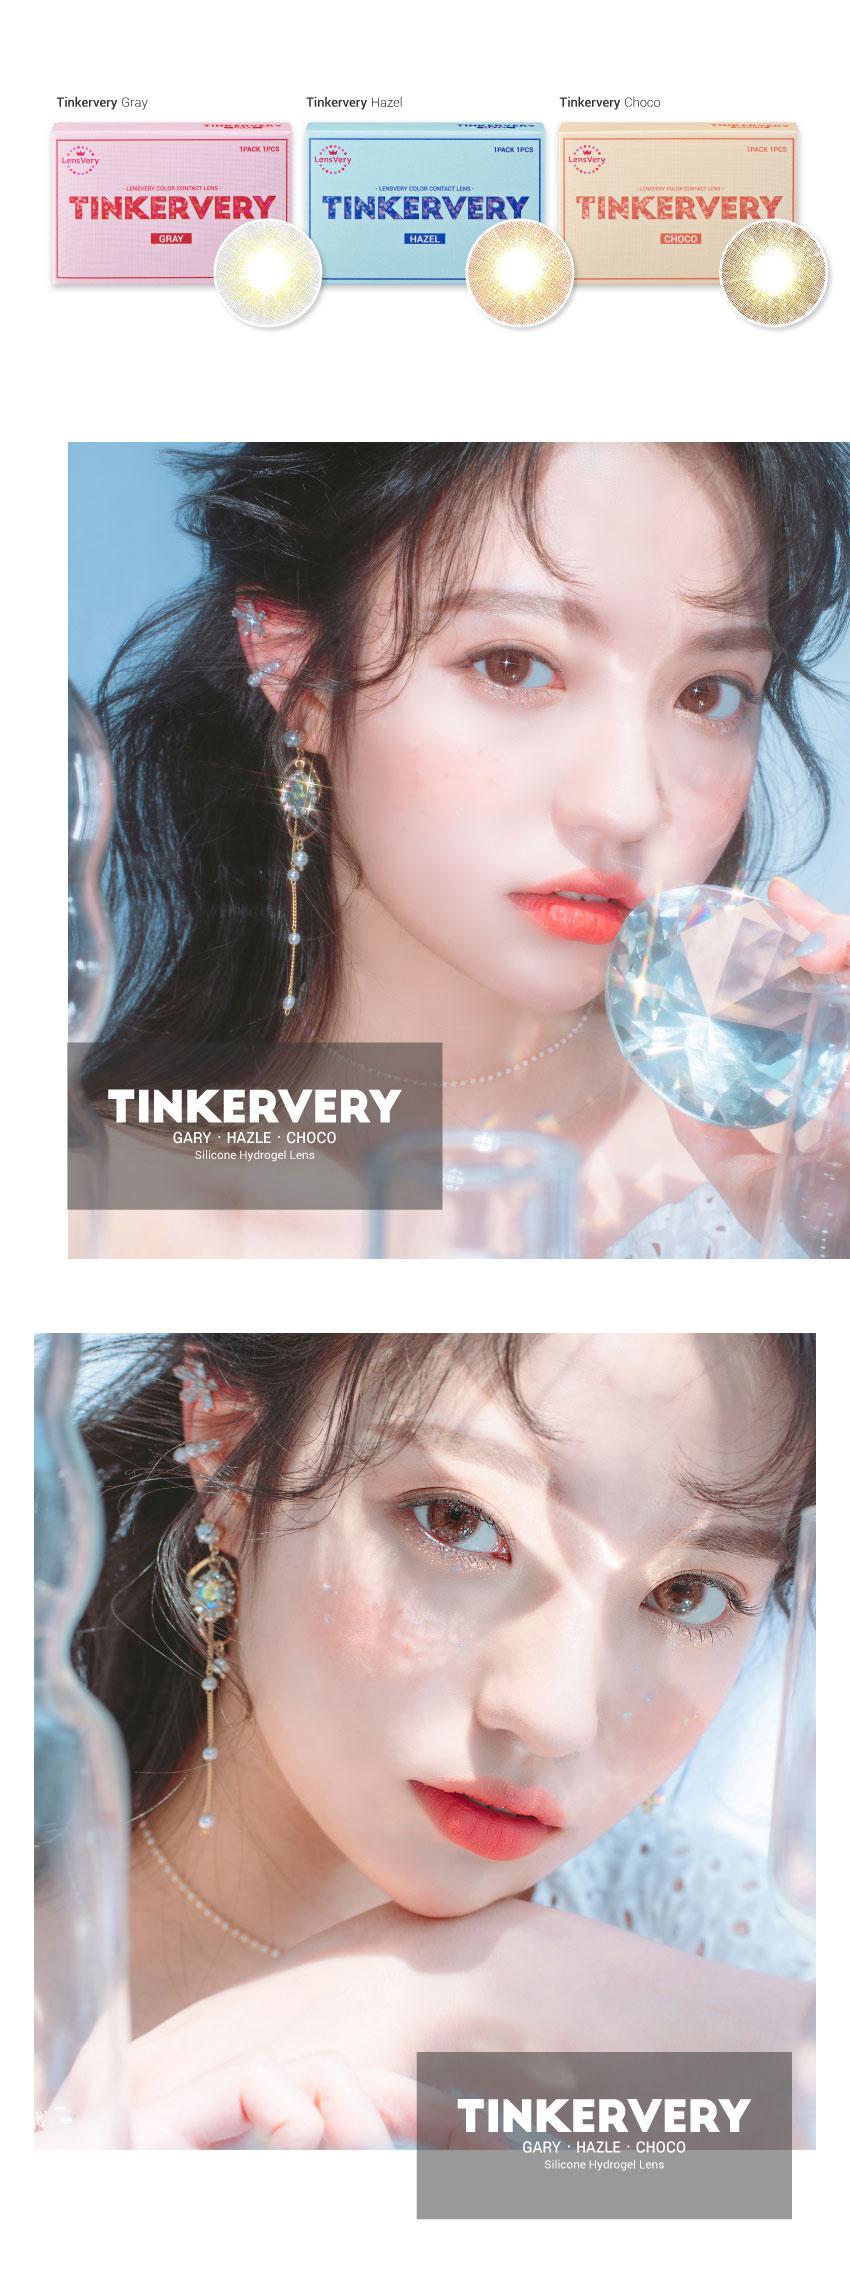 tinkervery-new1.jpg